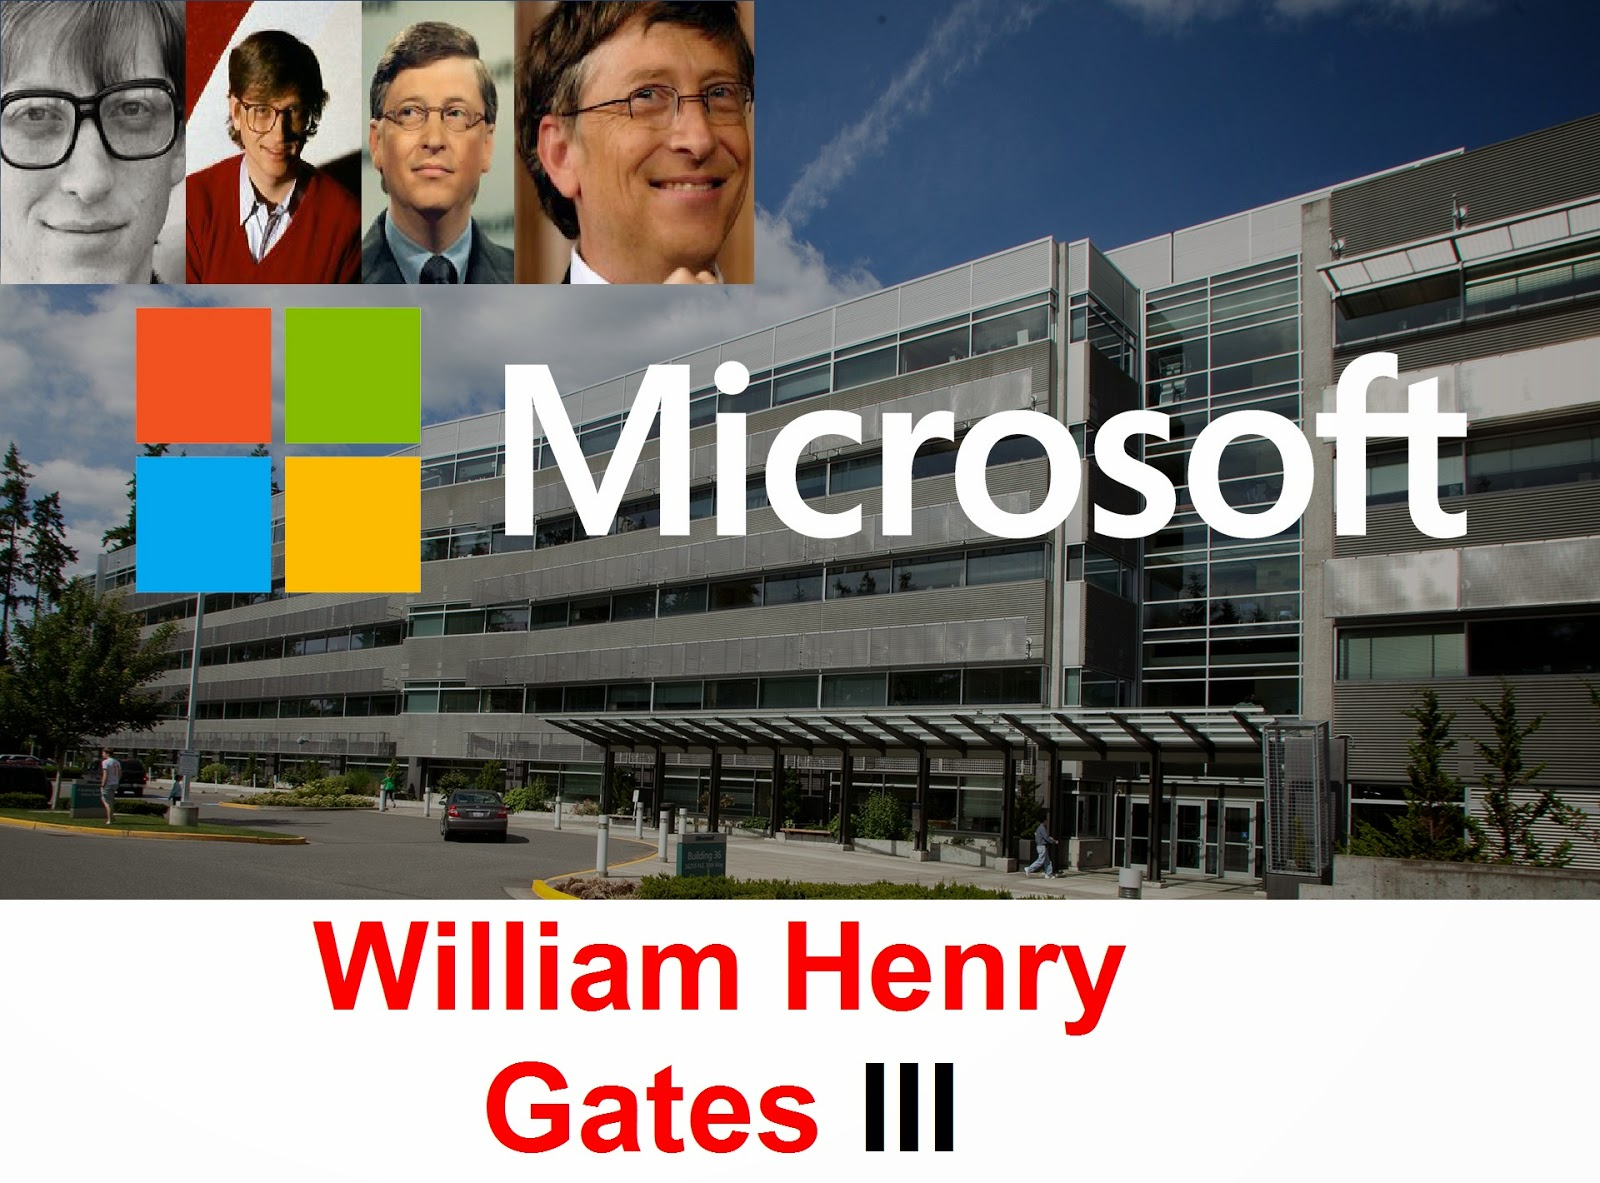 William Henry Gates III